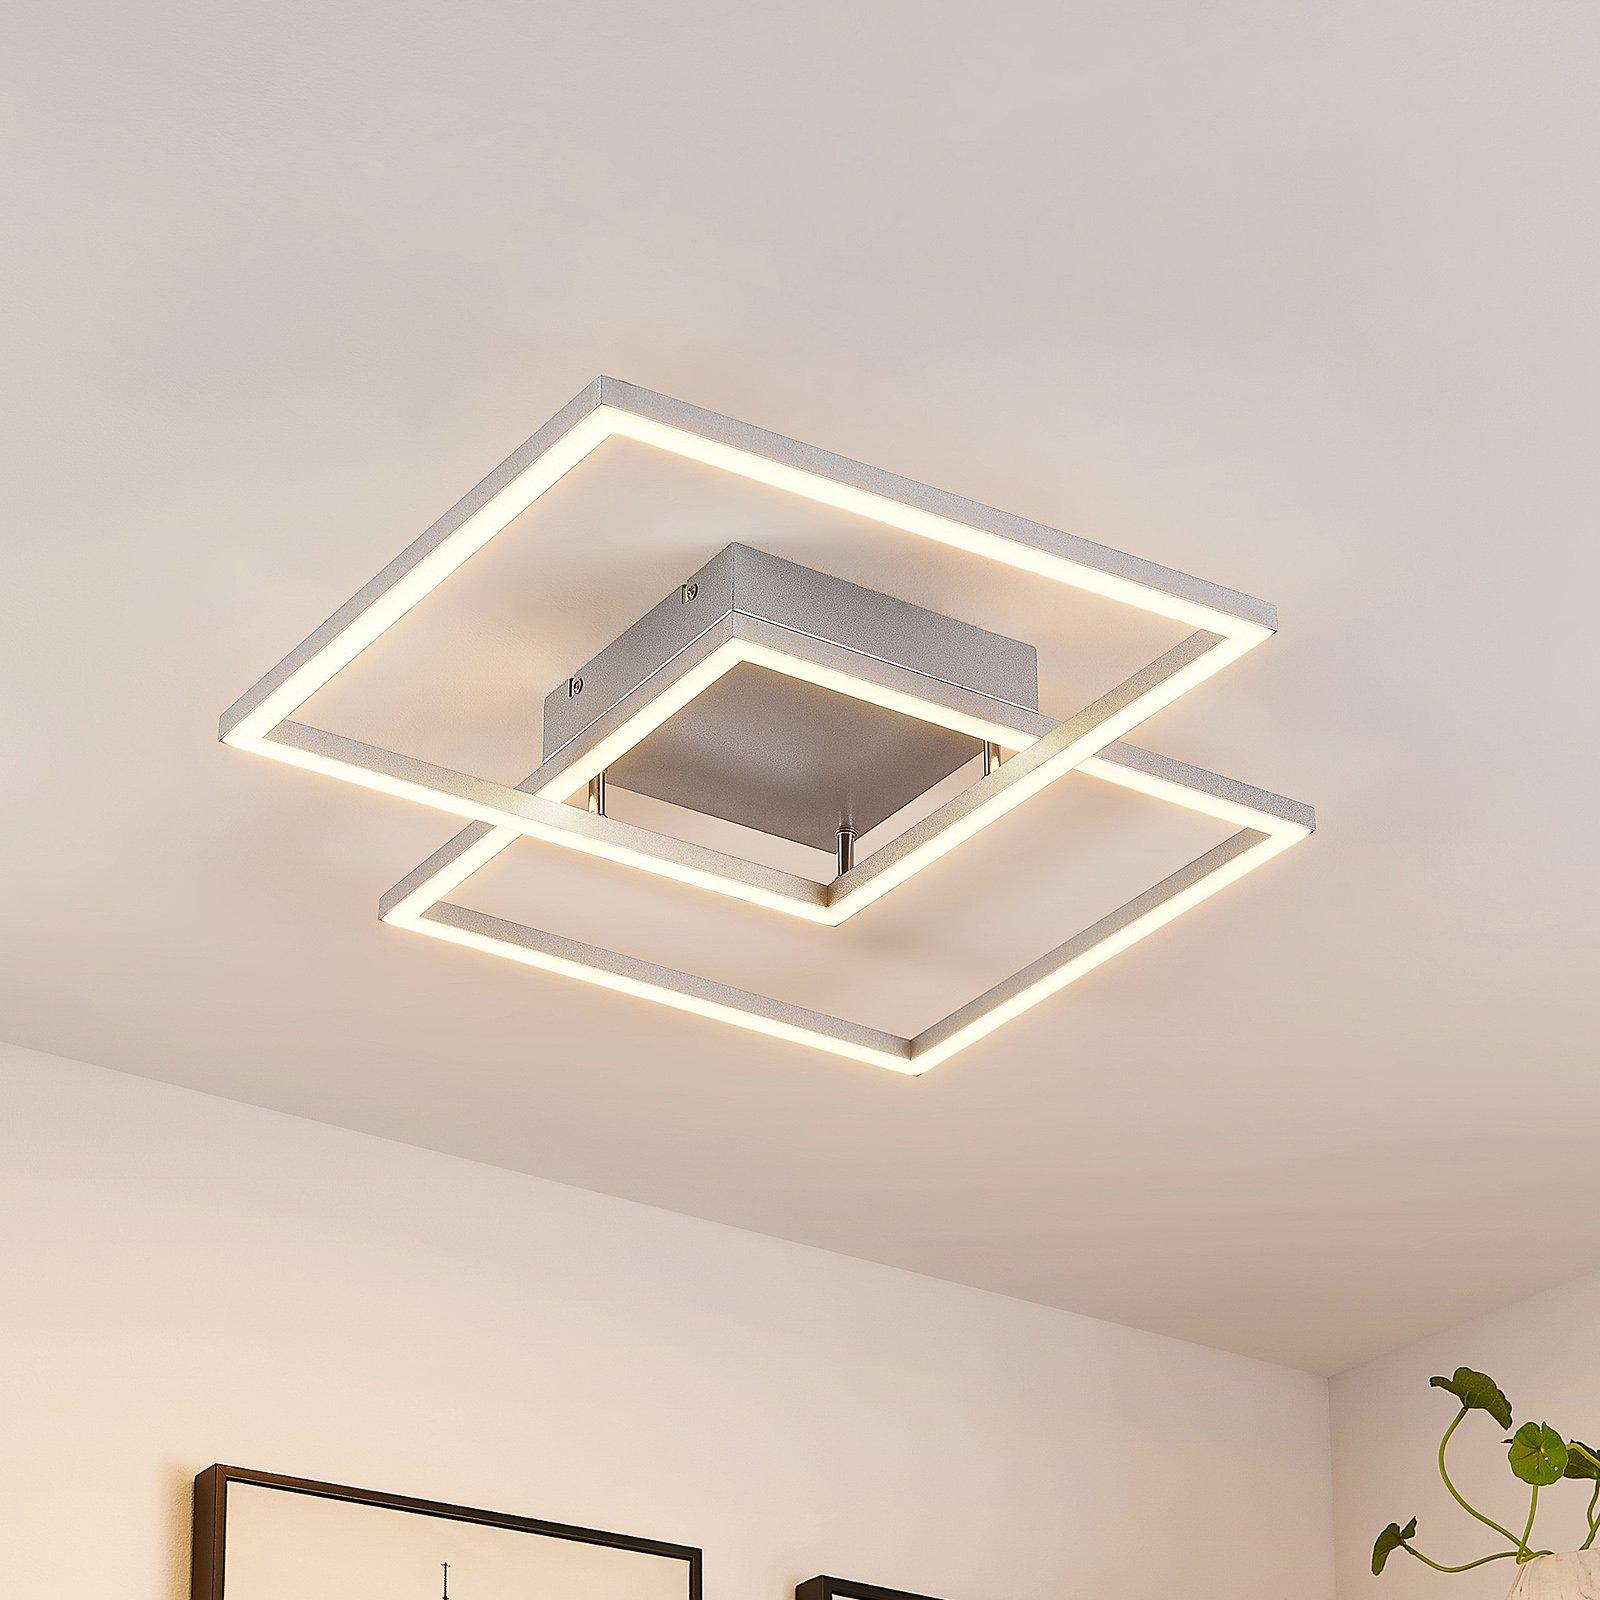 Lucande Muir LED-taklampe, kvadratisk, CCT